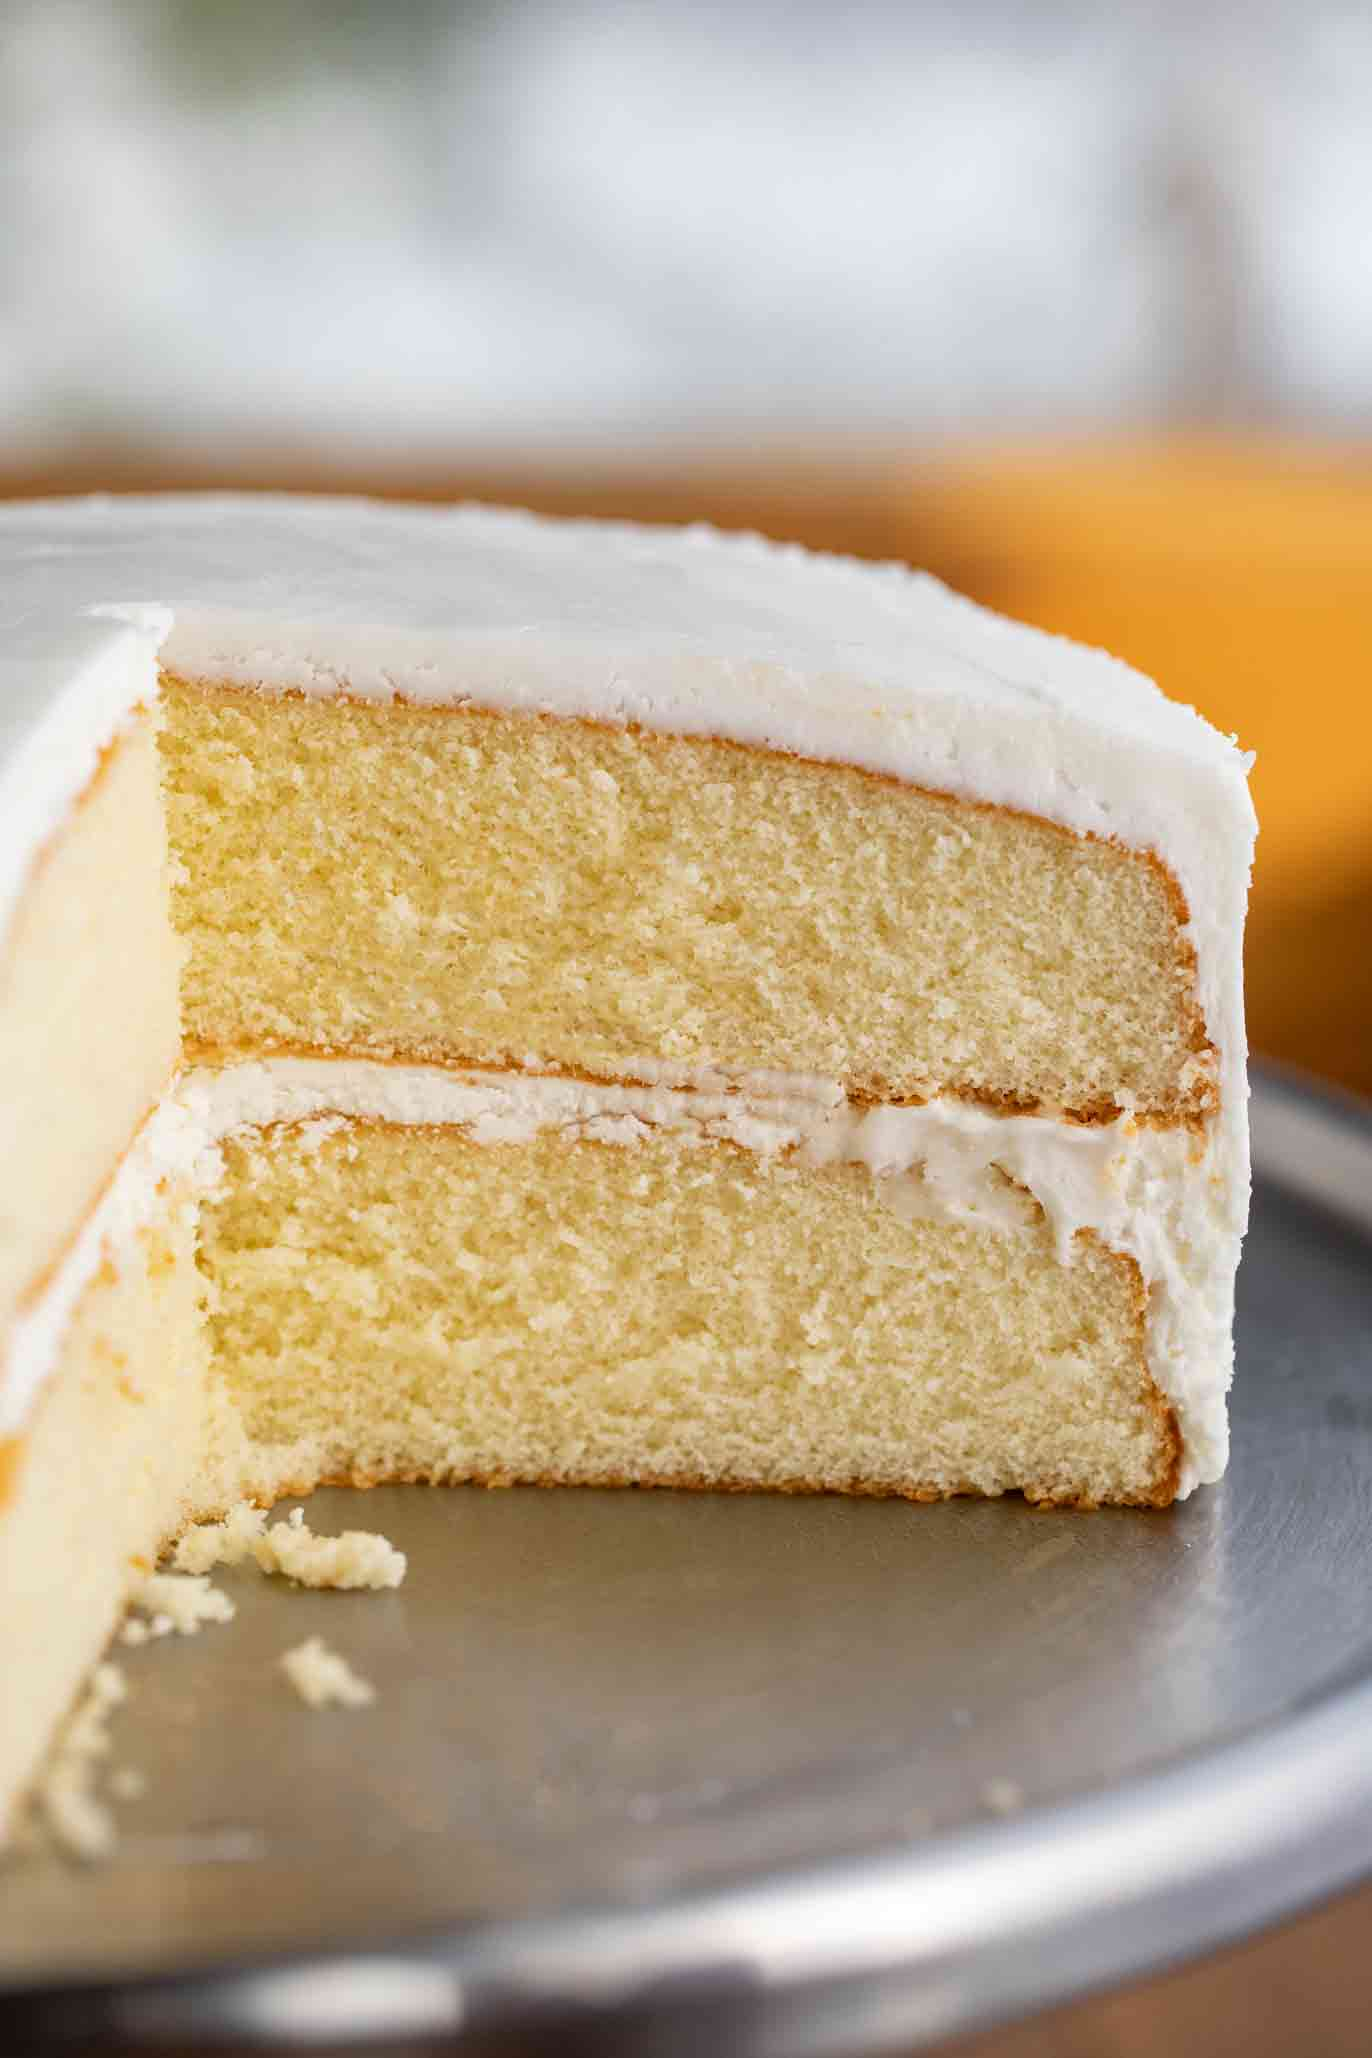 Simple Cake Recipe Anyone Can Bake! in 2020 | Easy vanilla ...